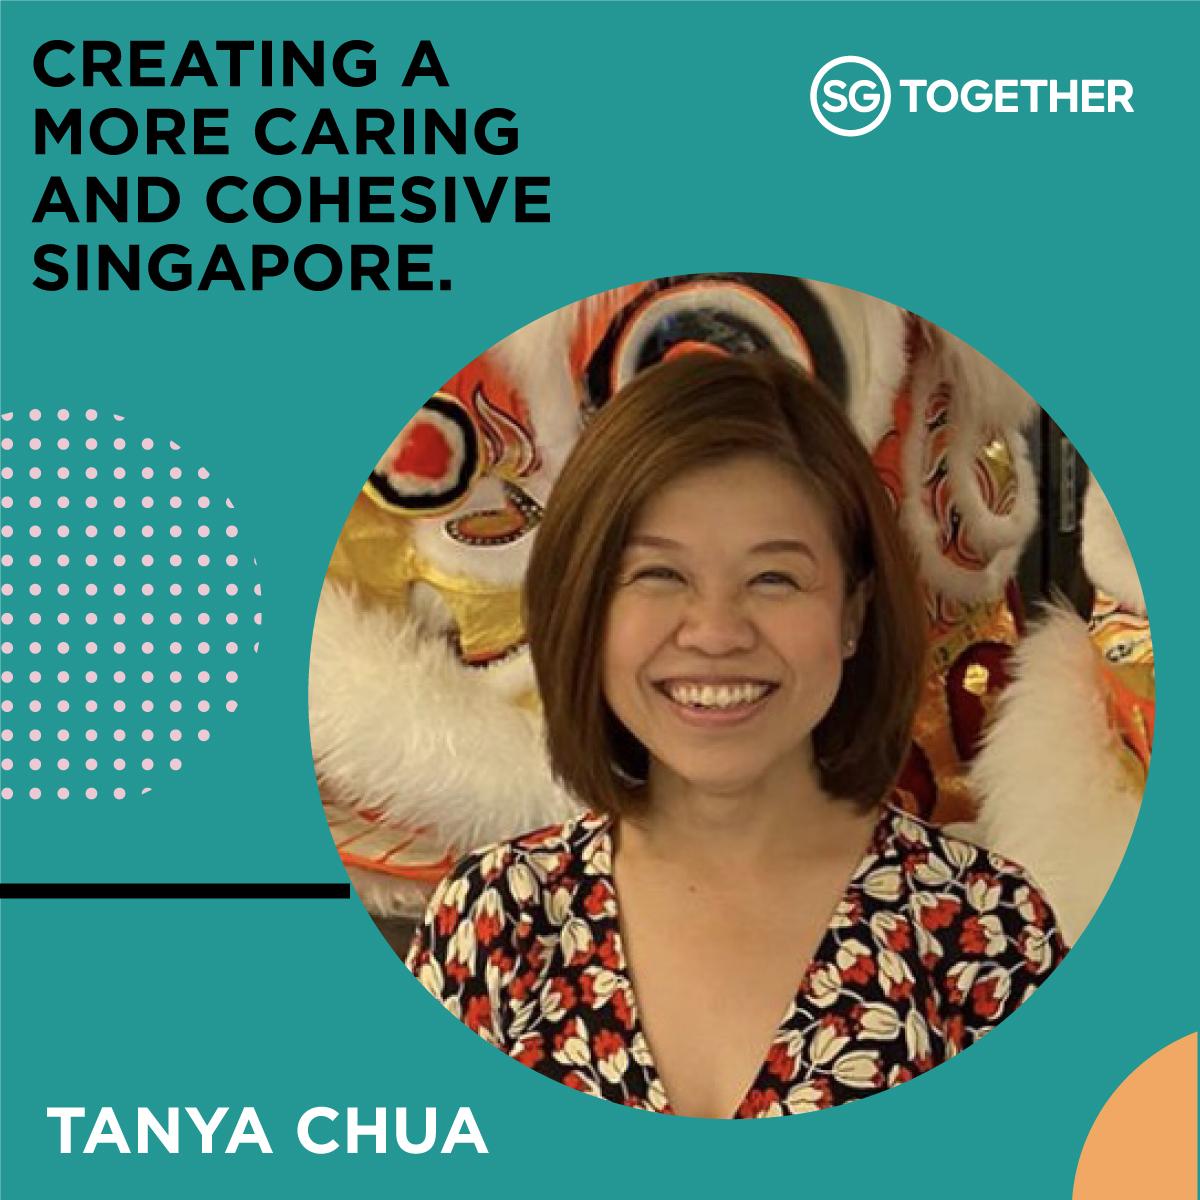 Tanya Chua